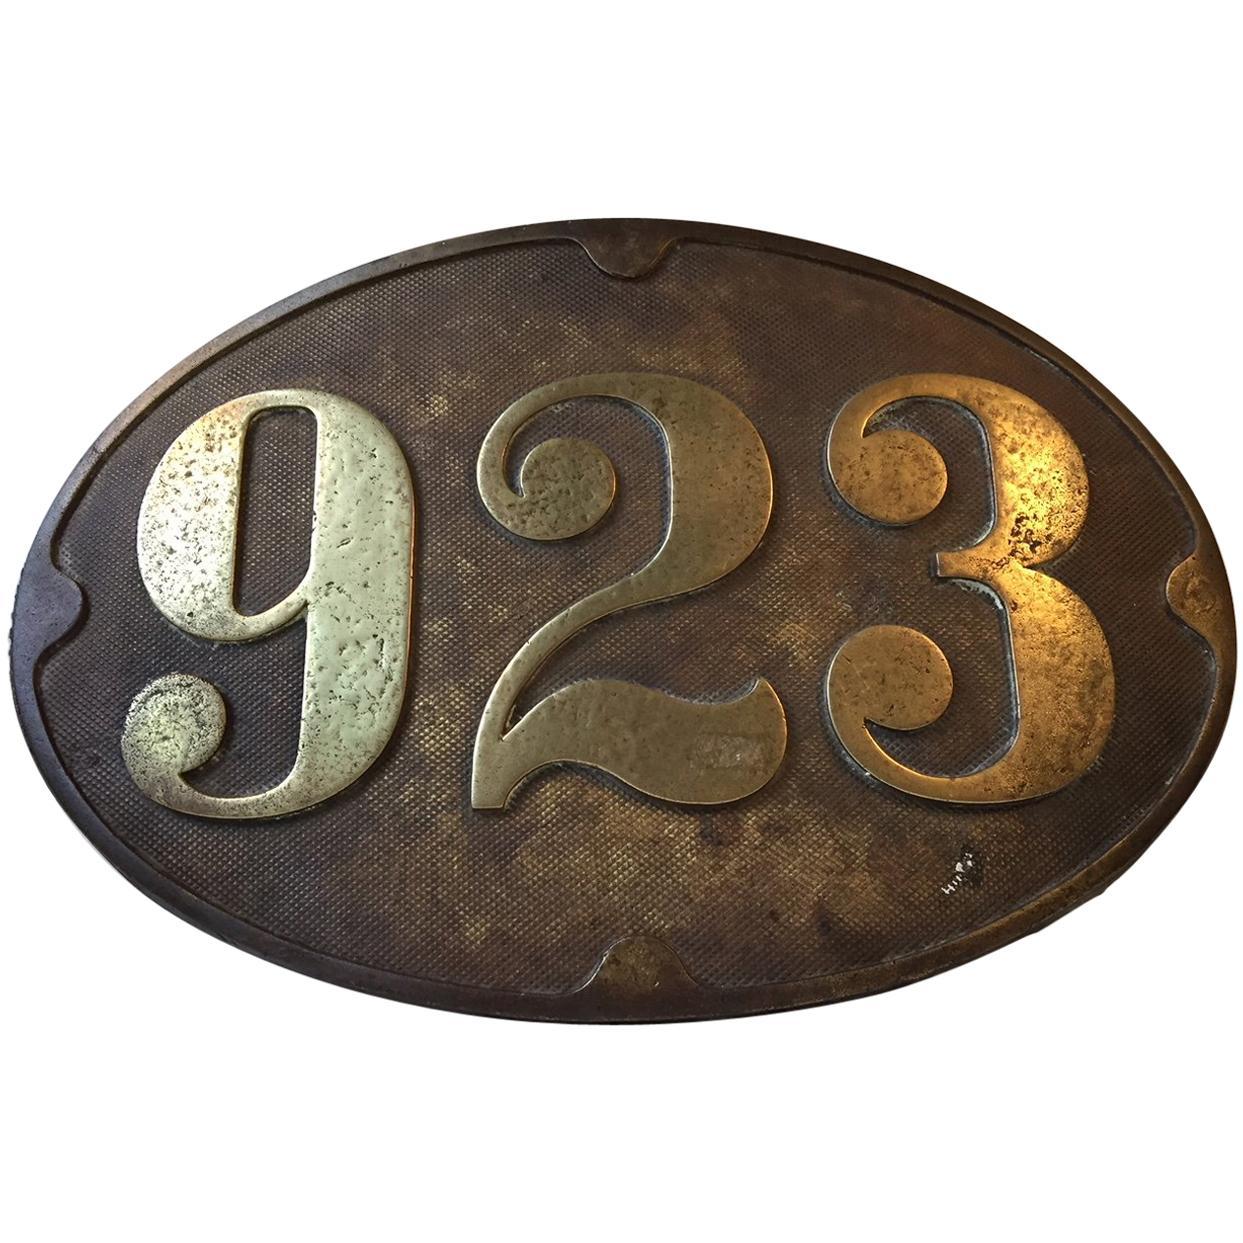 Antique Bronze Sign from Danish Train, 1910s